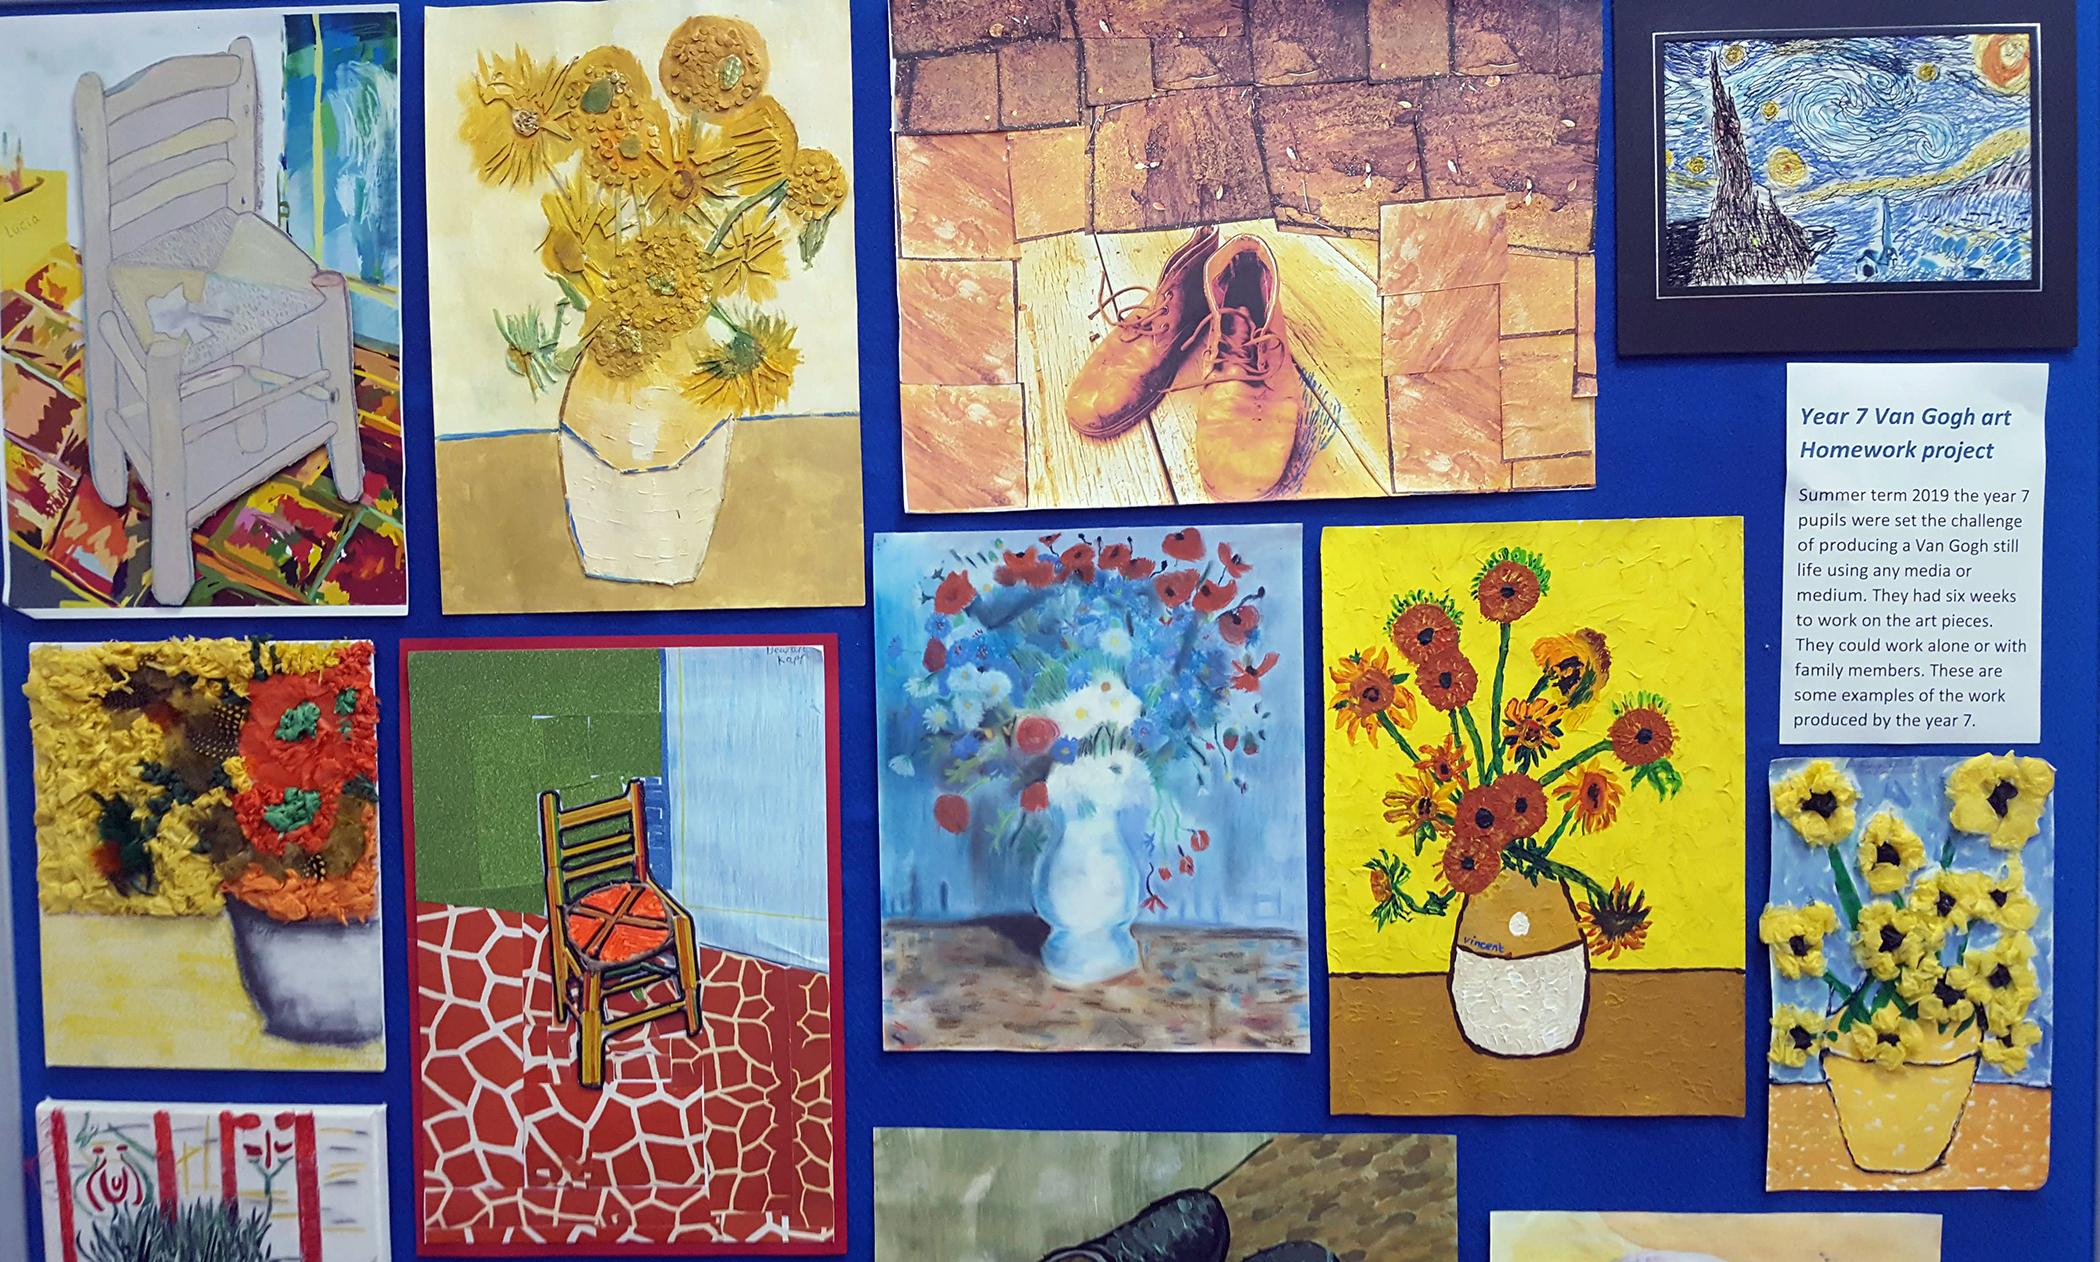 Year 7 Van Gogh artwork